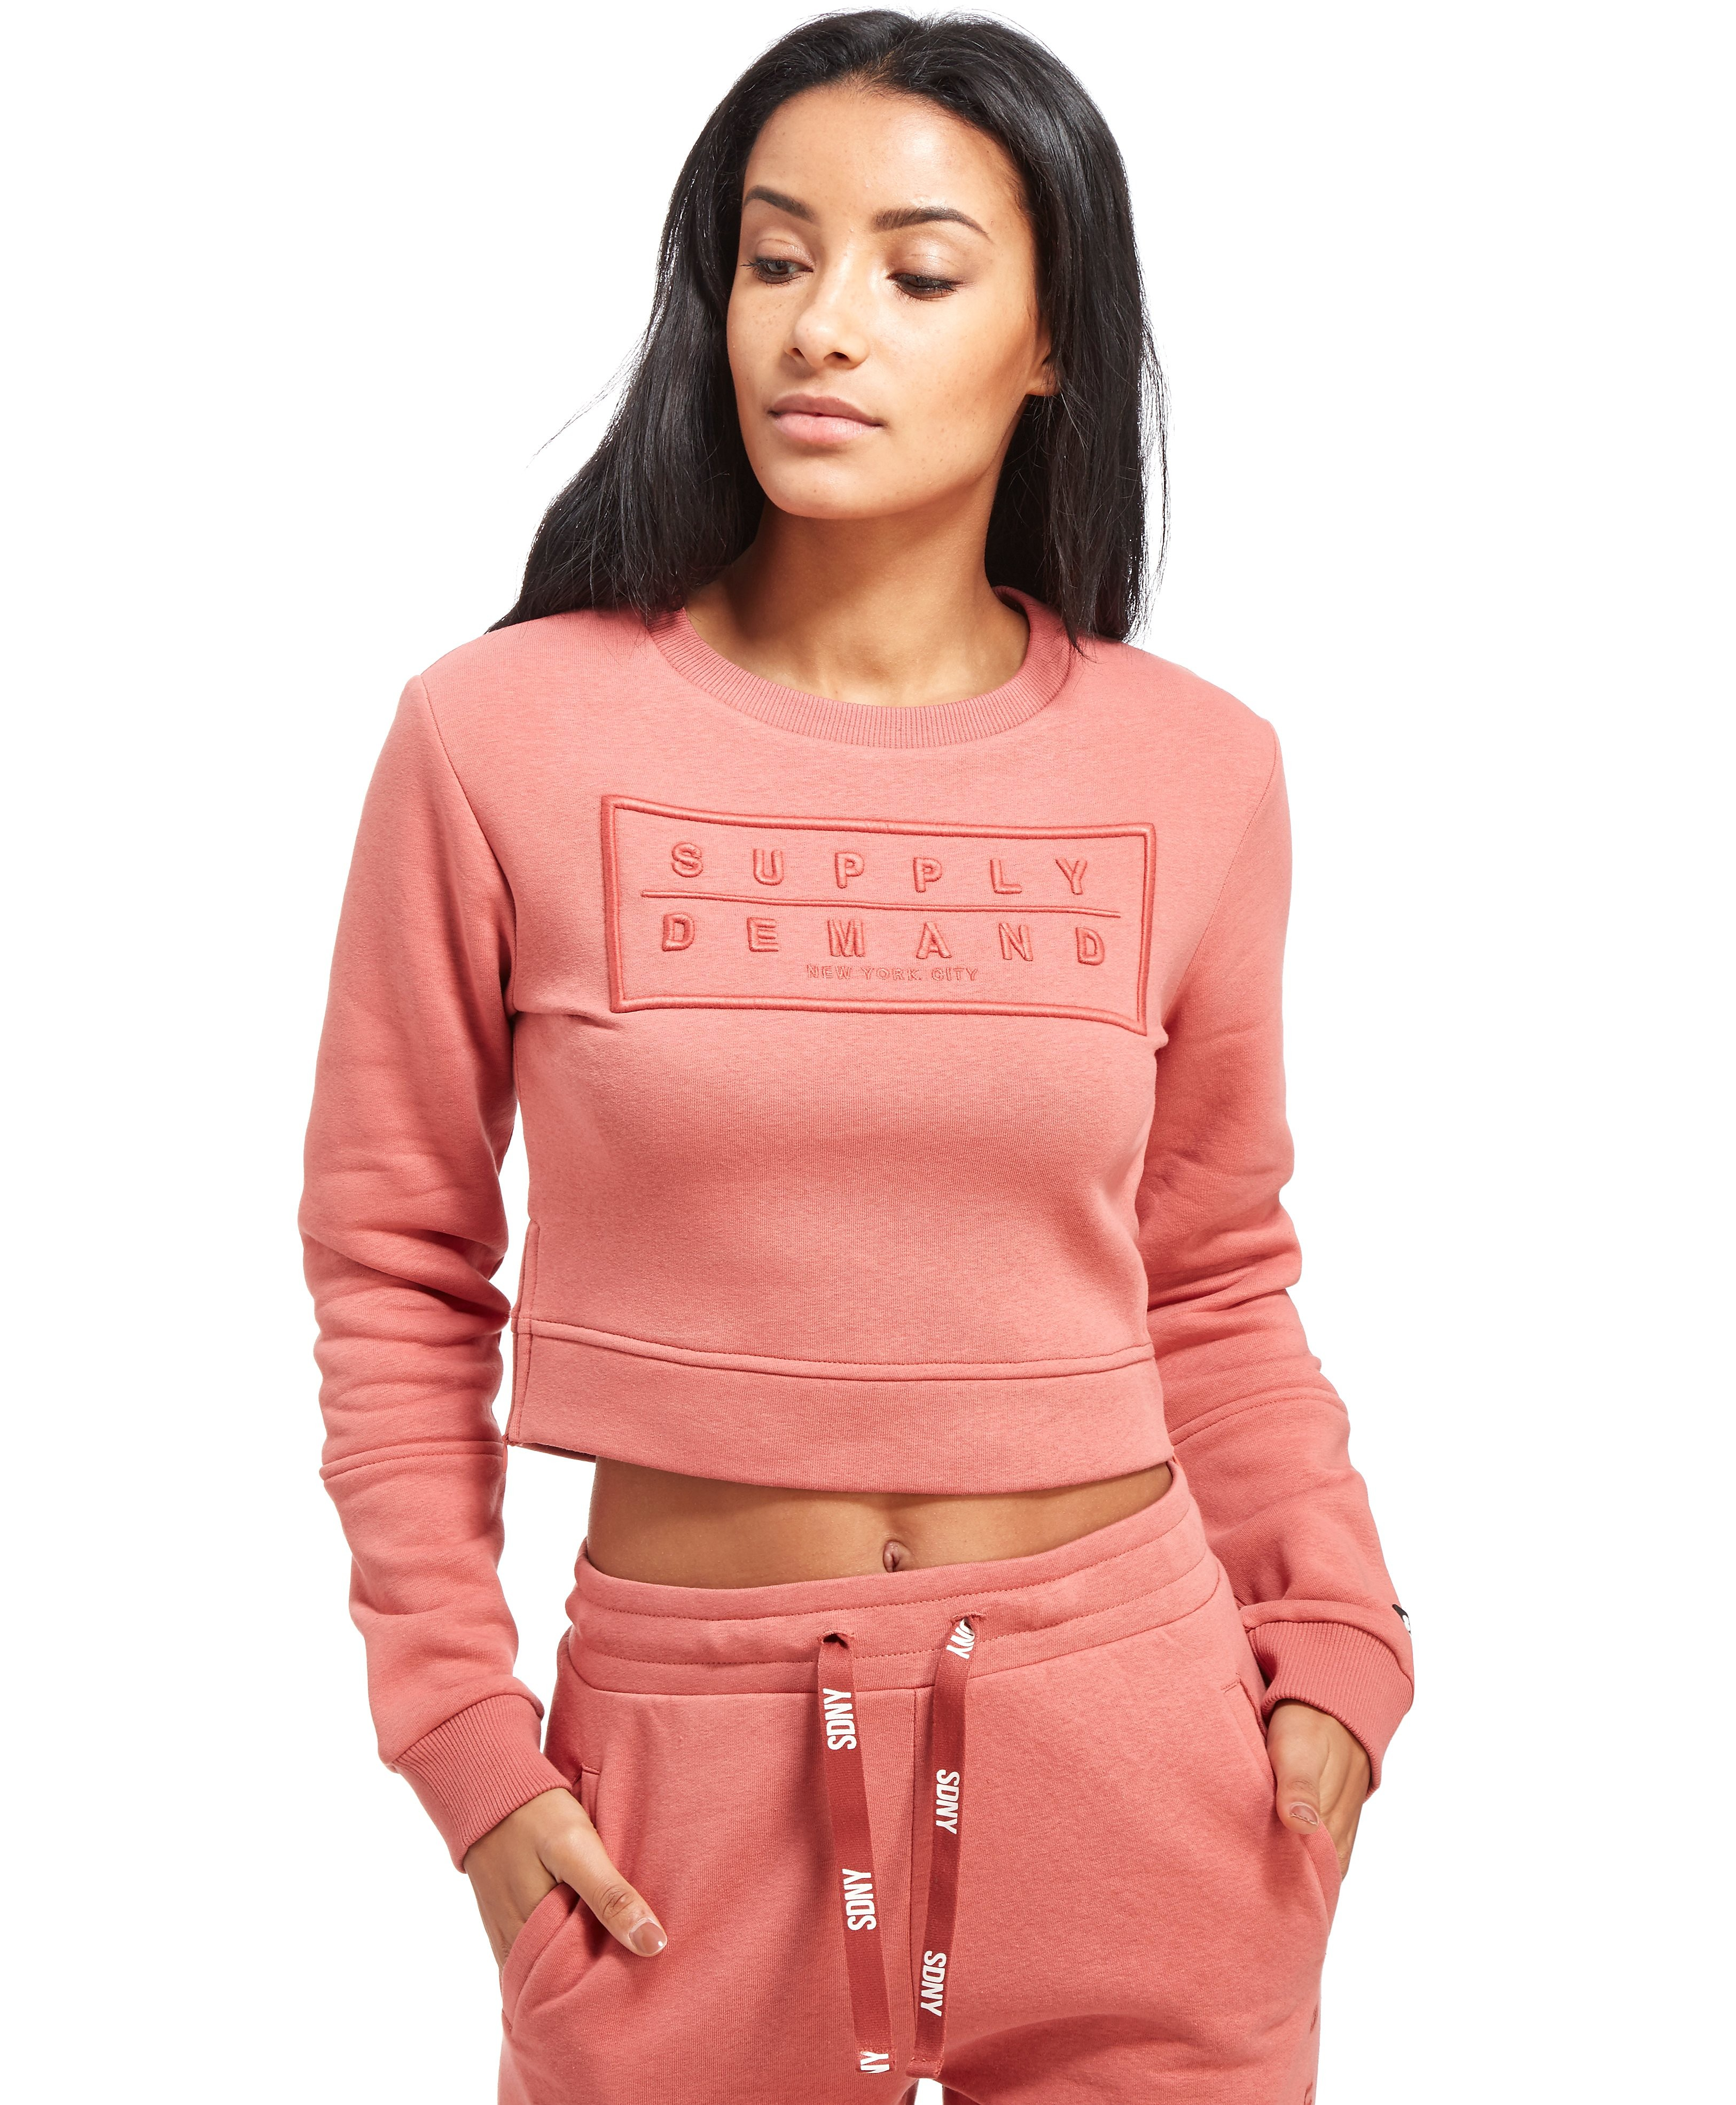 Supply & Demand Boxy Crew Sweatshirt